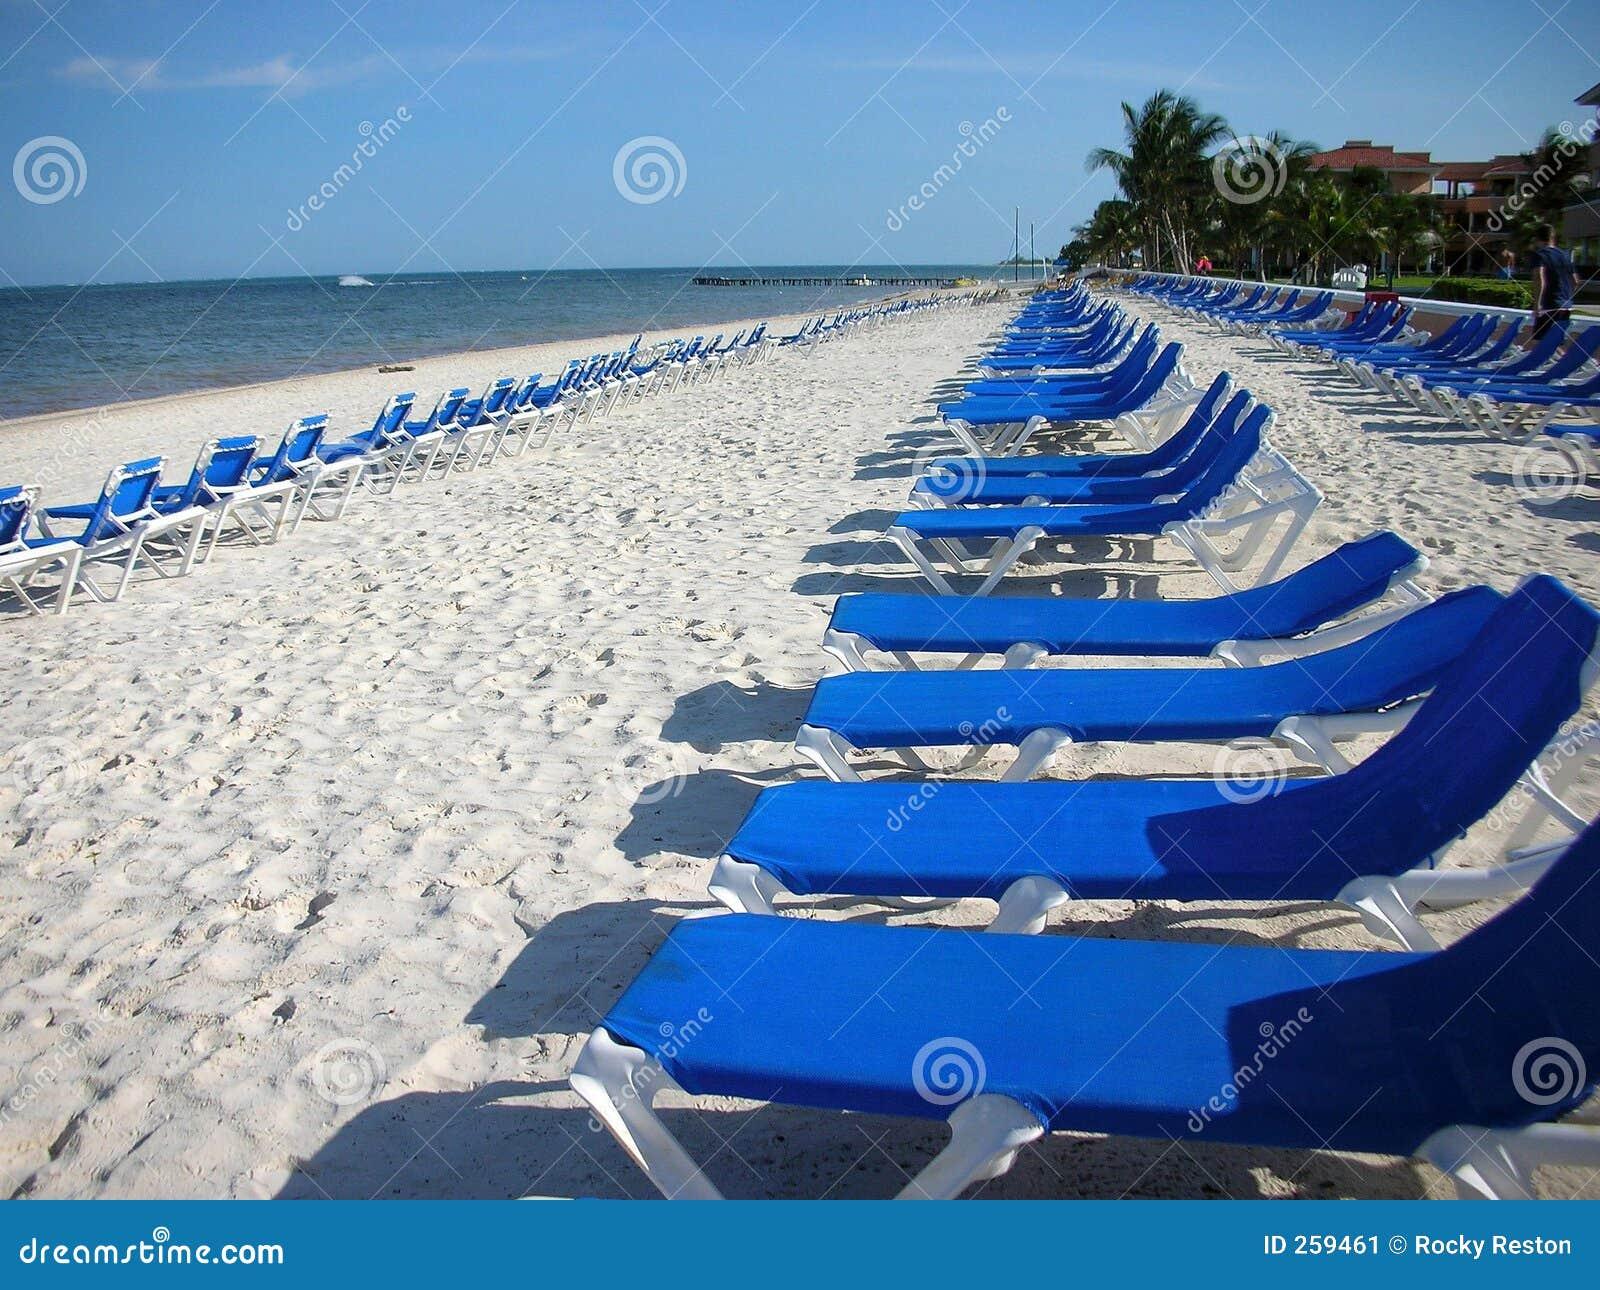 beach ... & Beach Recliners Stock Image - Image: 259461 islam-shia.org